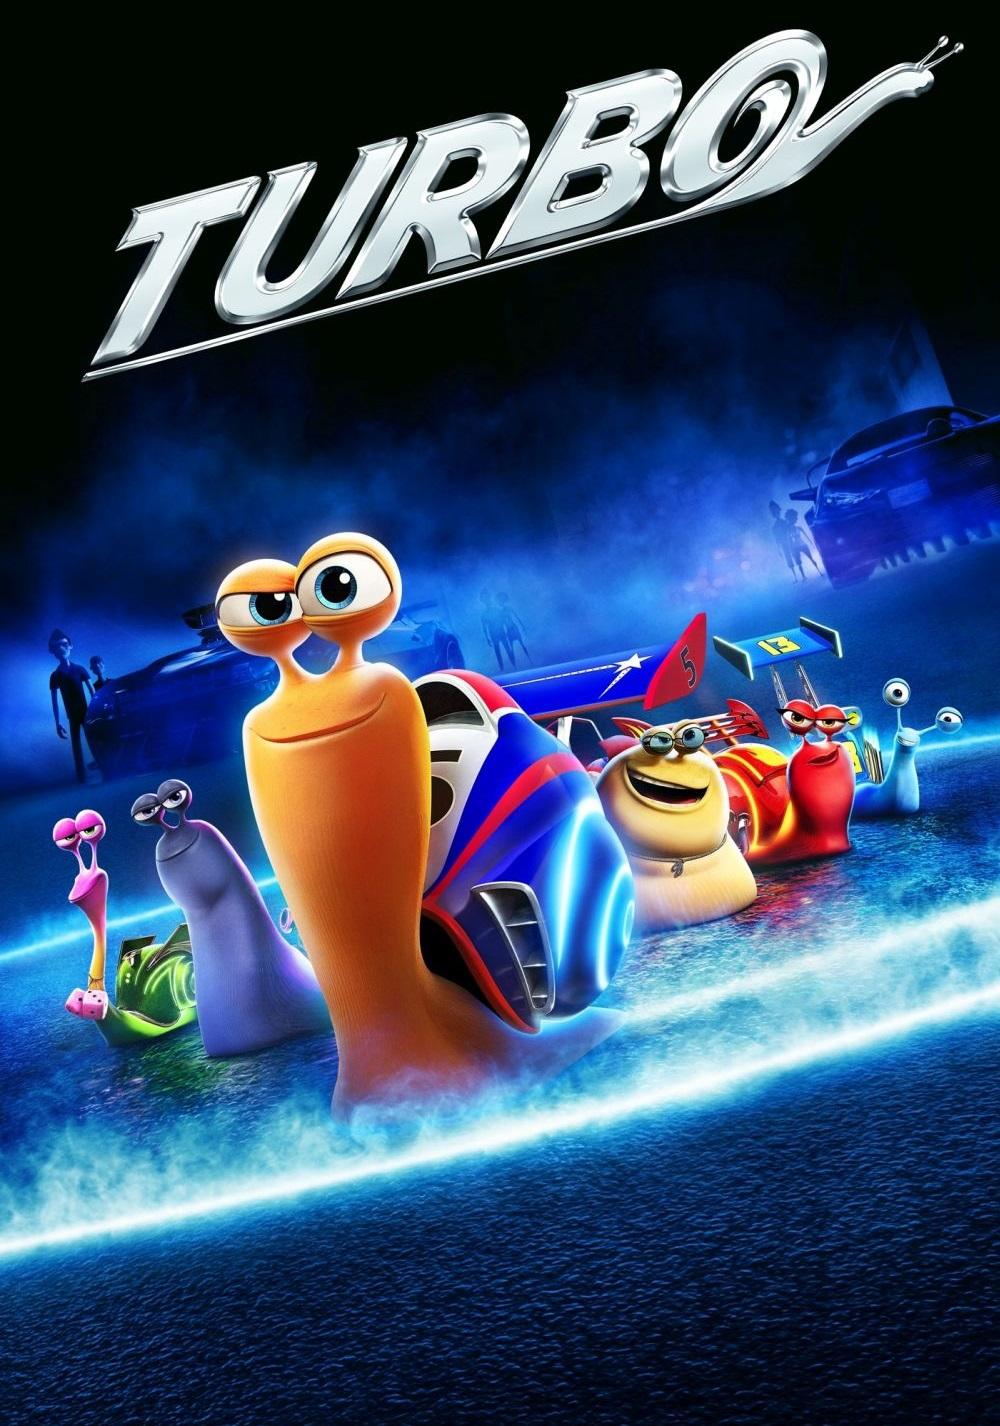 turbo | movie fanart | fanart.tv